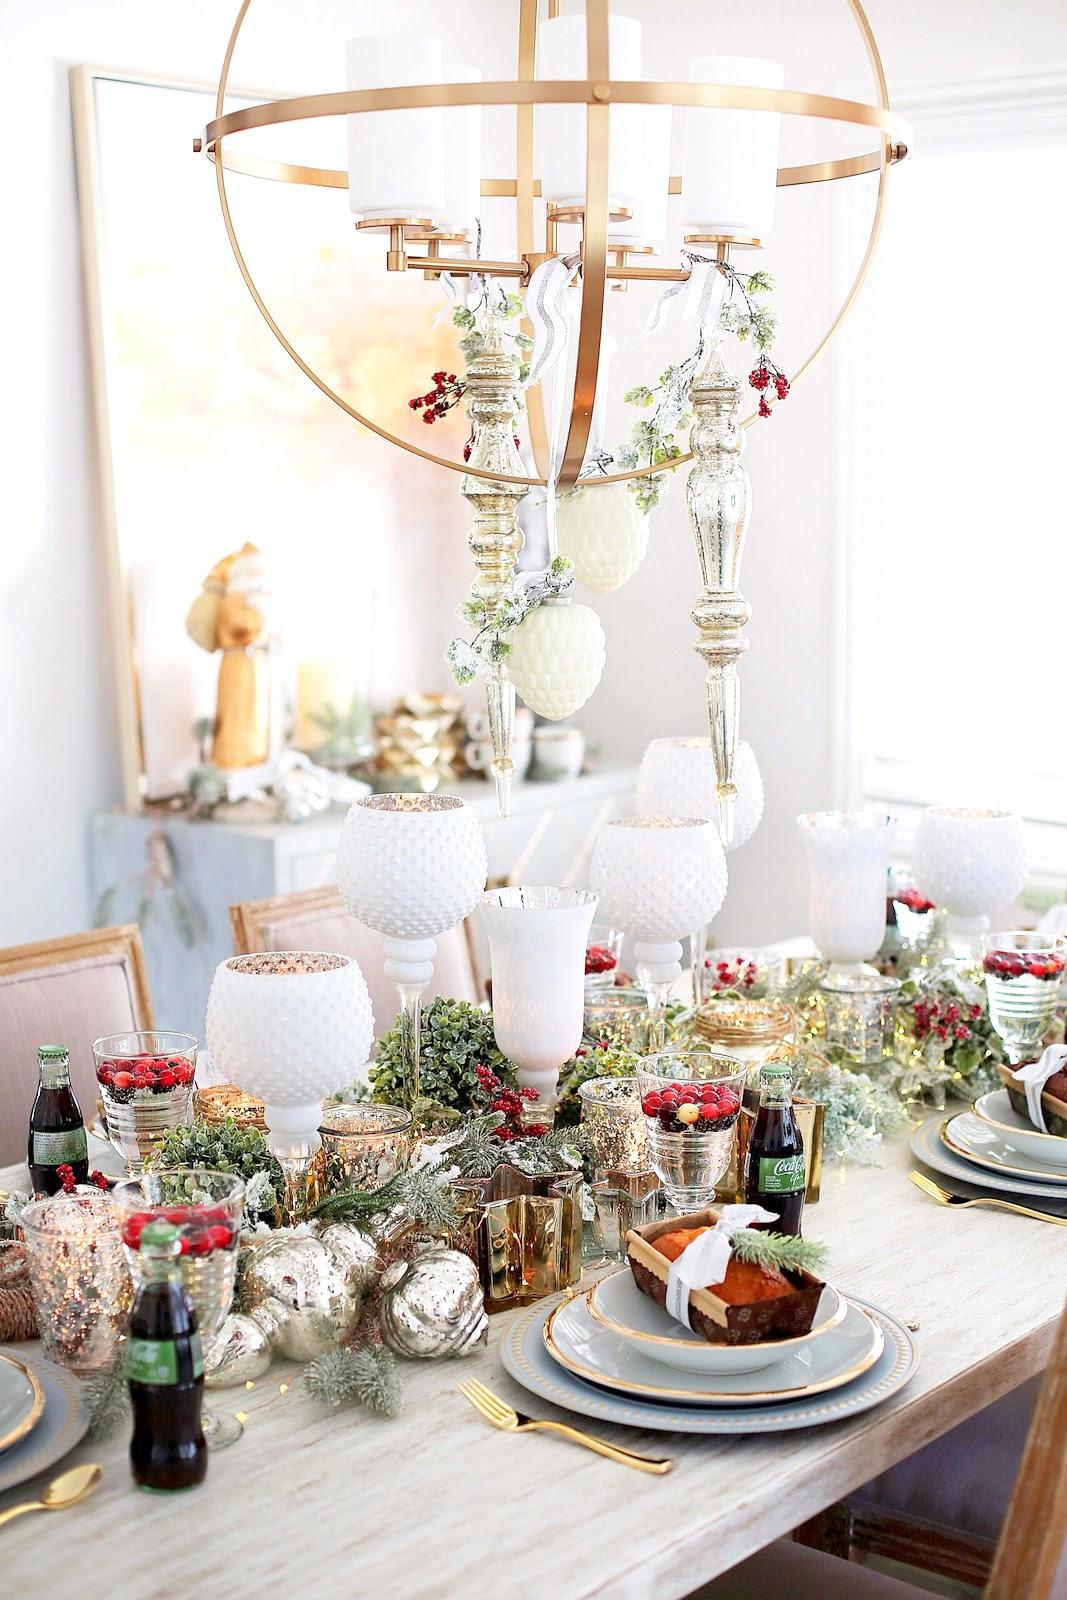 Dining Room Holiday Decor Ideas | Home Decor | Sandy A La Mode